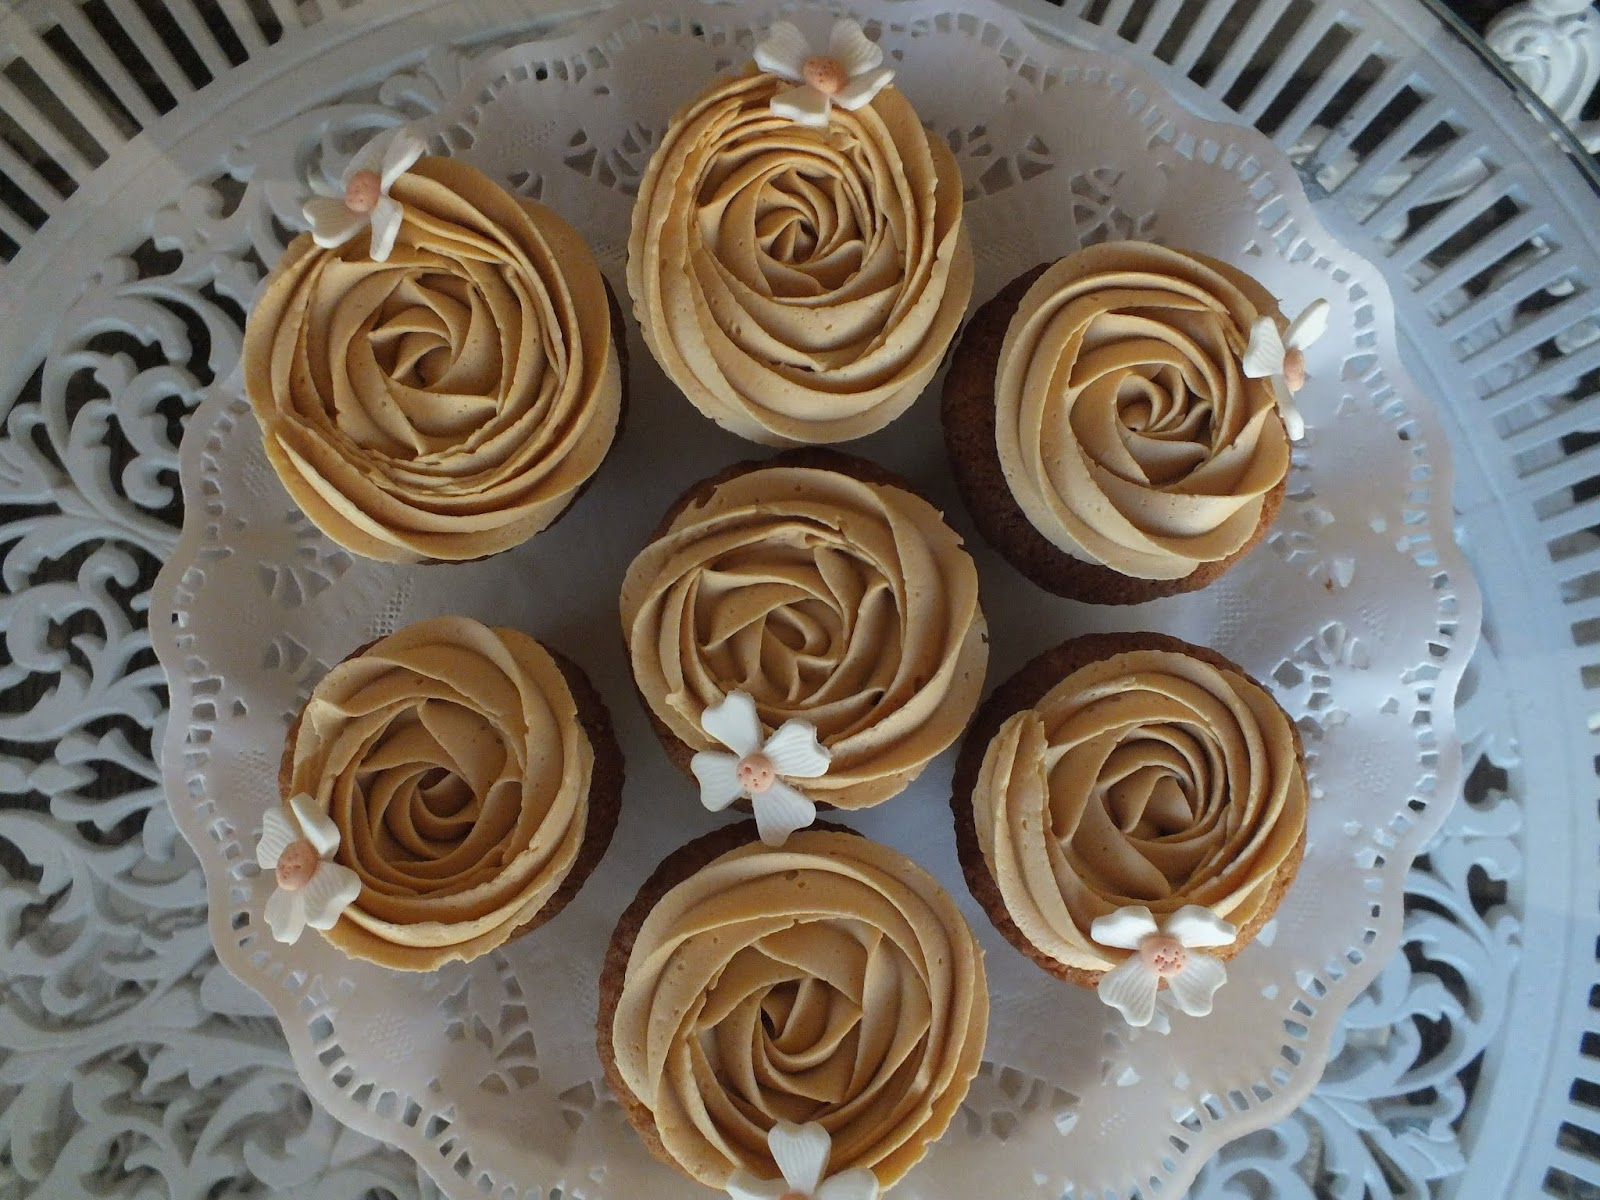 Dulces y algo m s tenerife cupcakes de cafe - Cupcakes tenerife ...